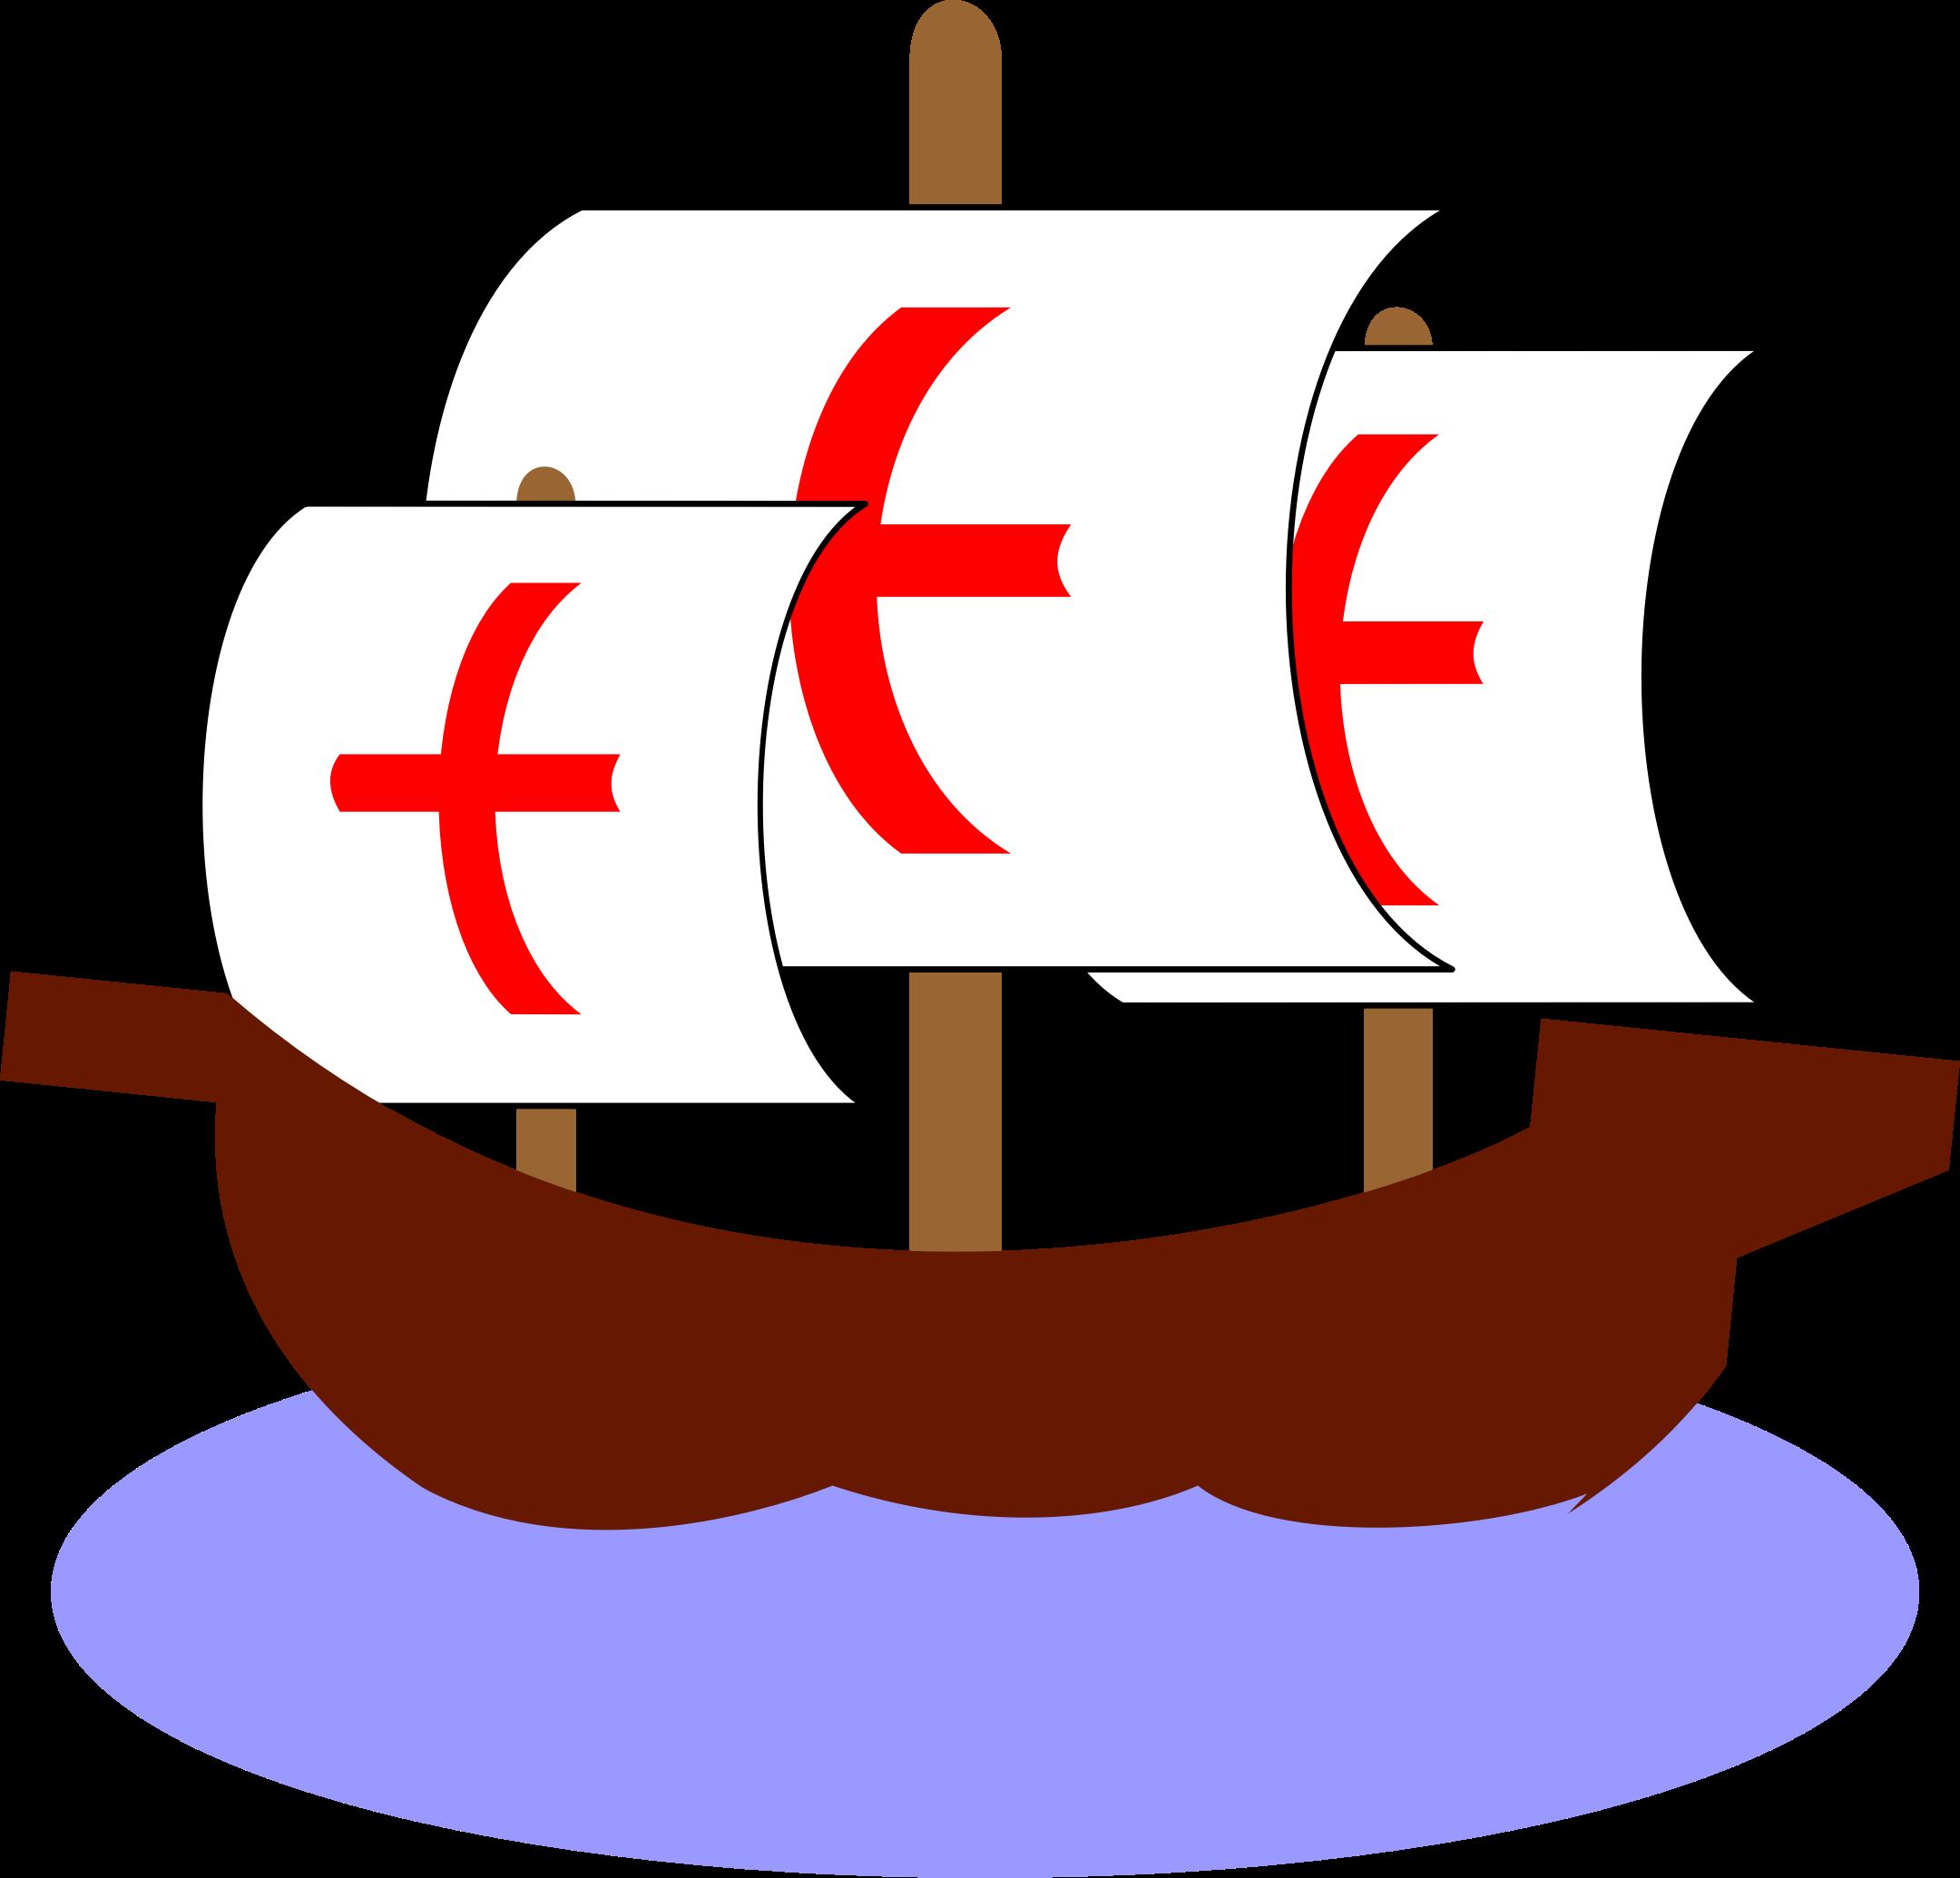 Caravel clipart small Clipart Caravel (Carabela) (Carabela) Caravel